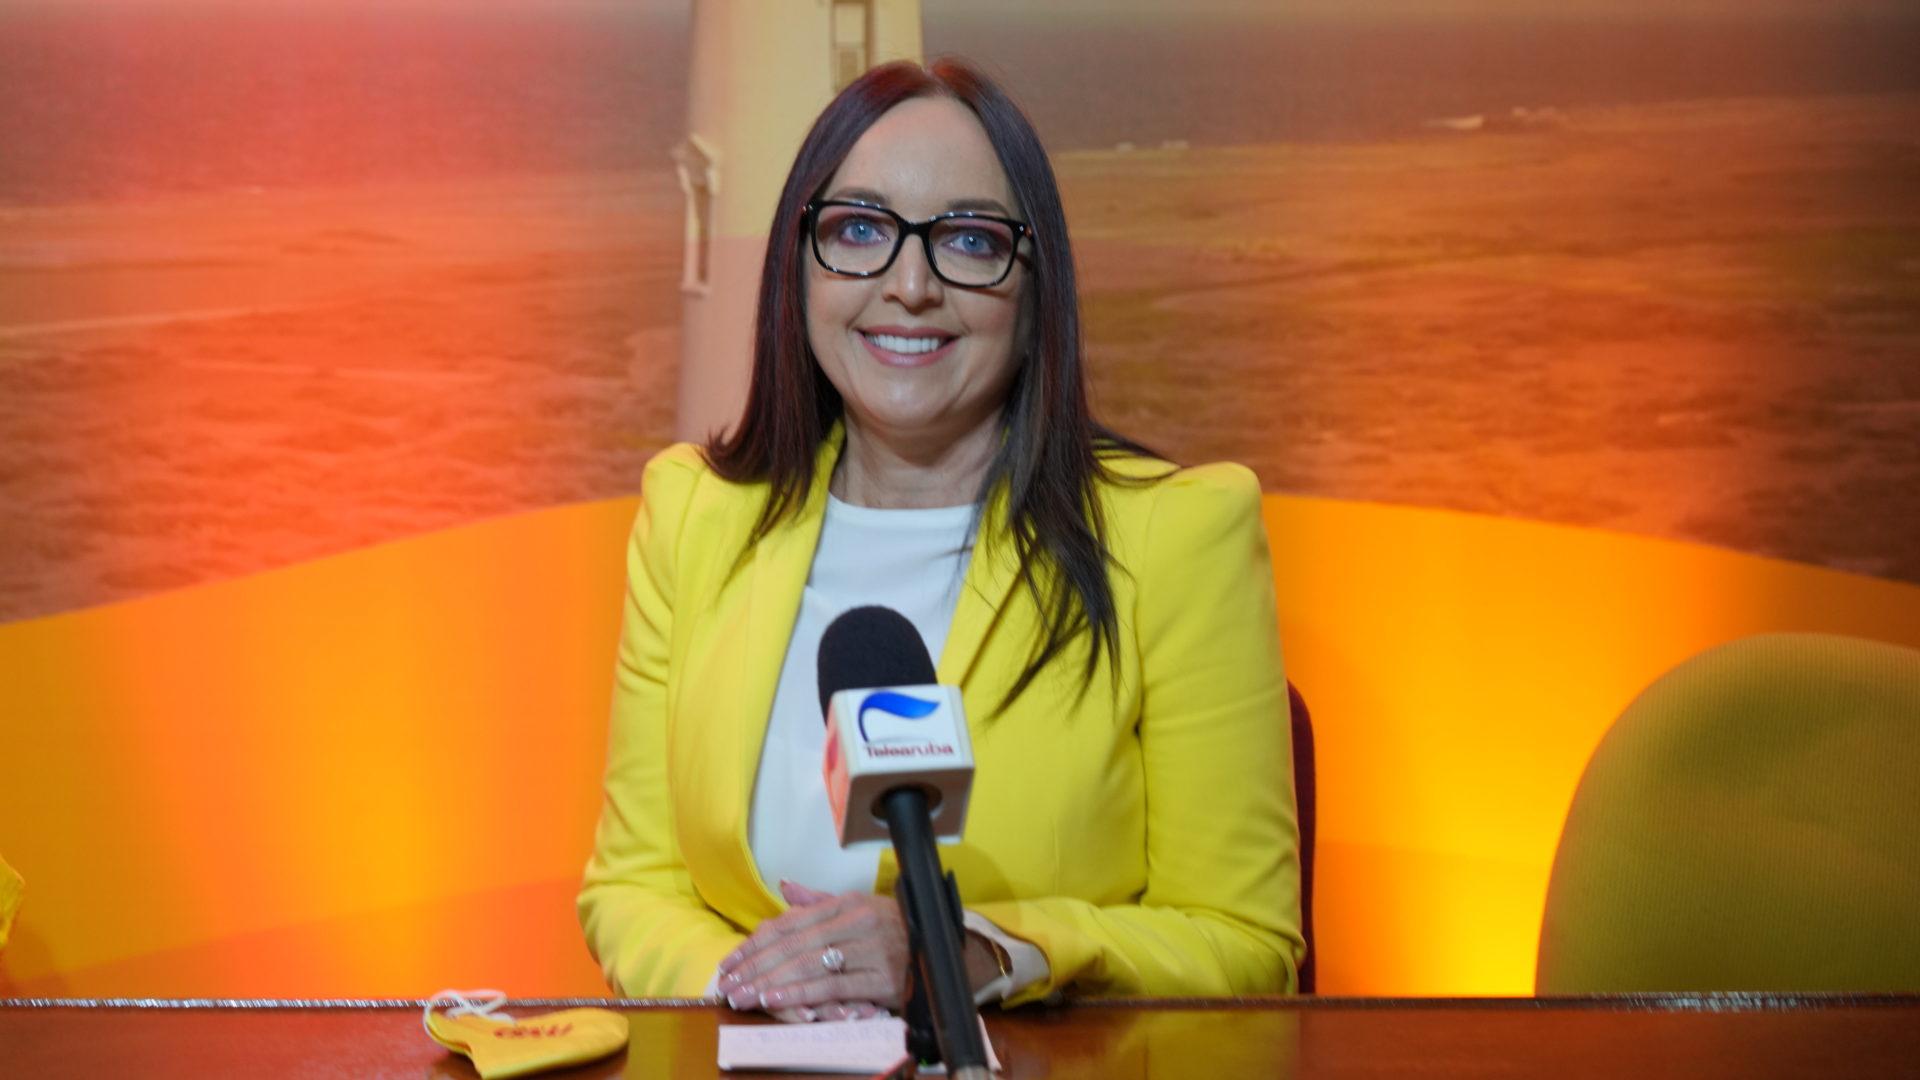 Partido MEP: SHANNON HENRIQUEZ CANDIDATO NOBO RIBA LISTA DI MEP